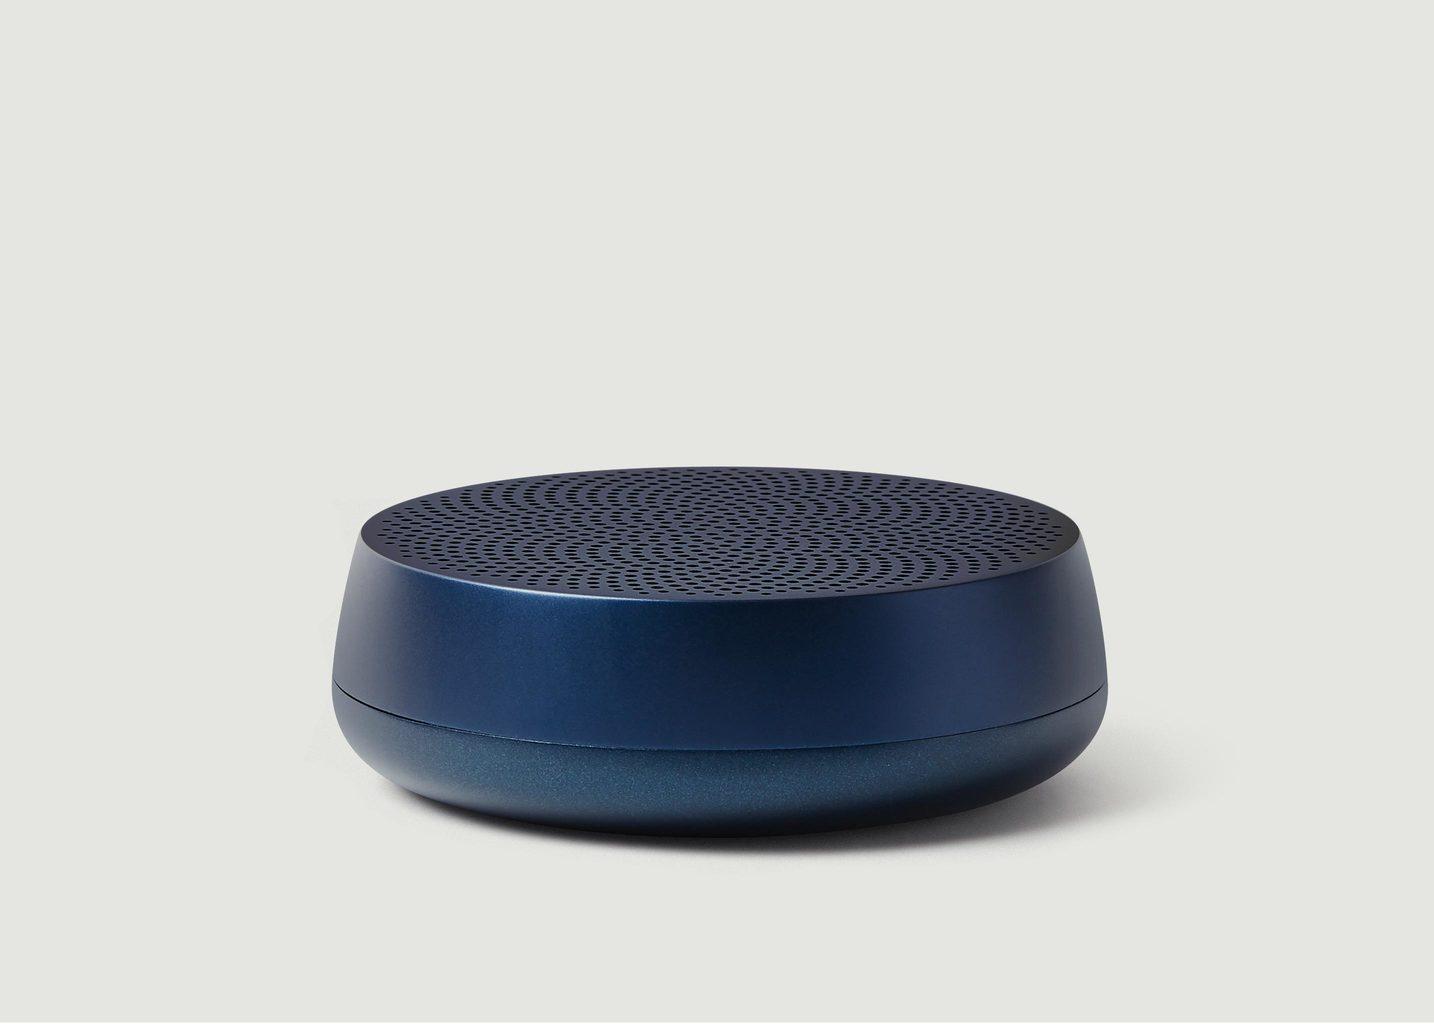 Enceinte Bluetooth Mino L - Lexon Design